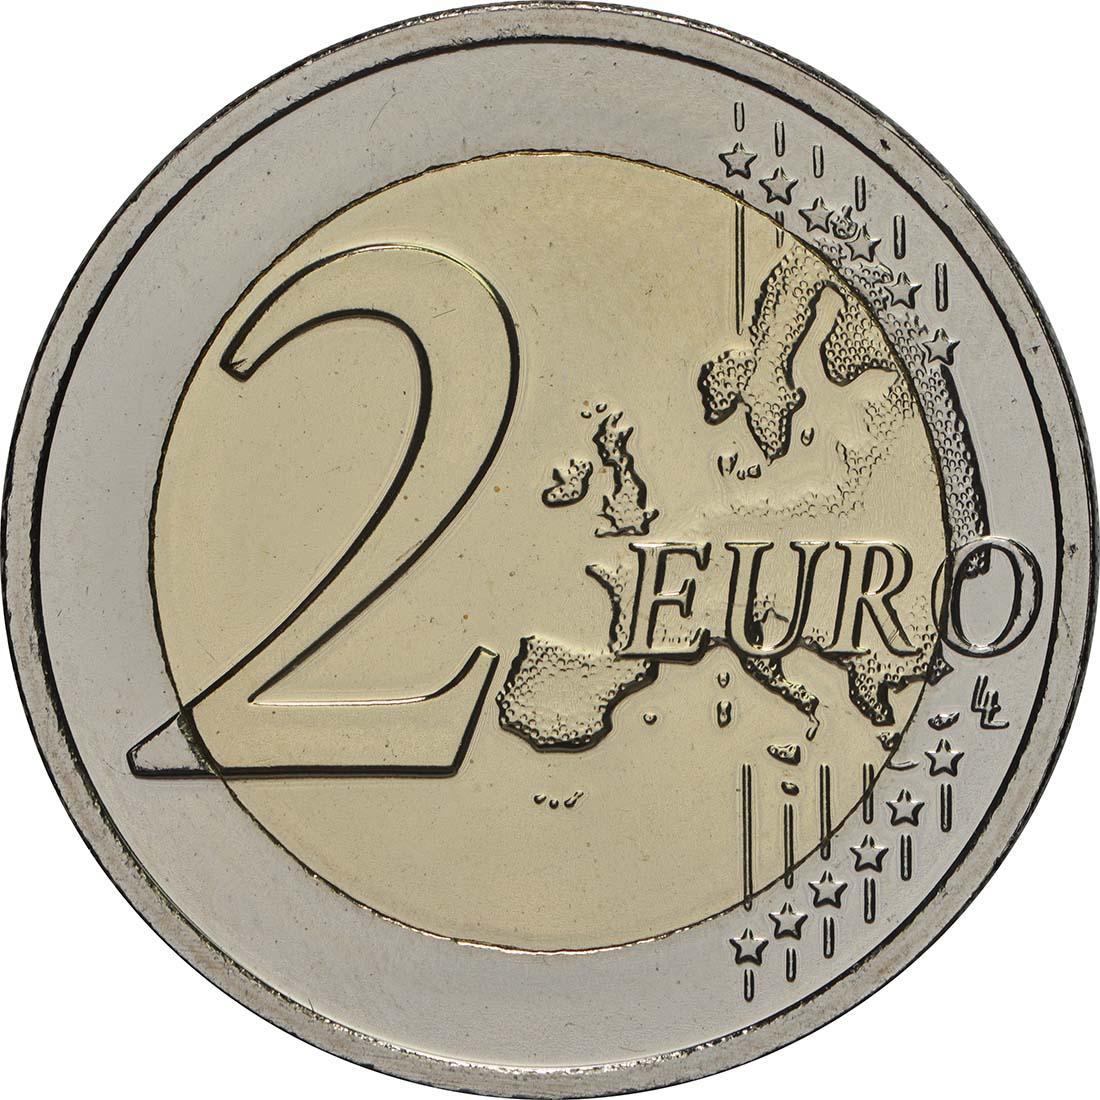 Vorderseite:Belgien : 2 Euro ESRO-2B Satellit  2018 bfr